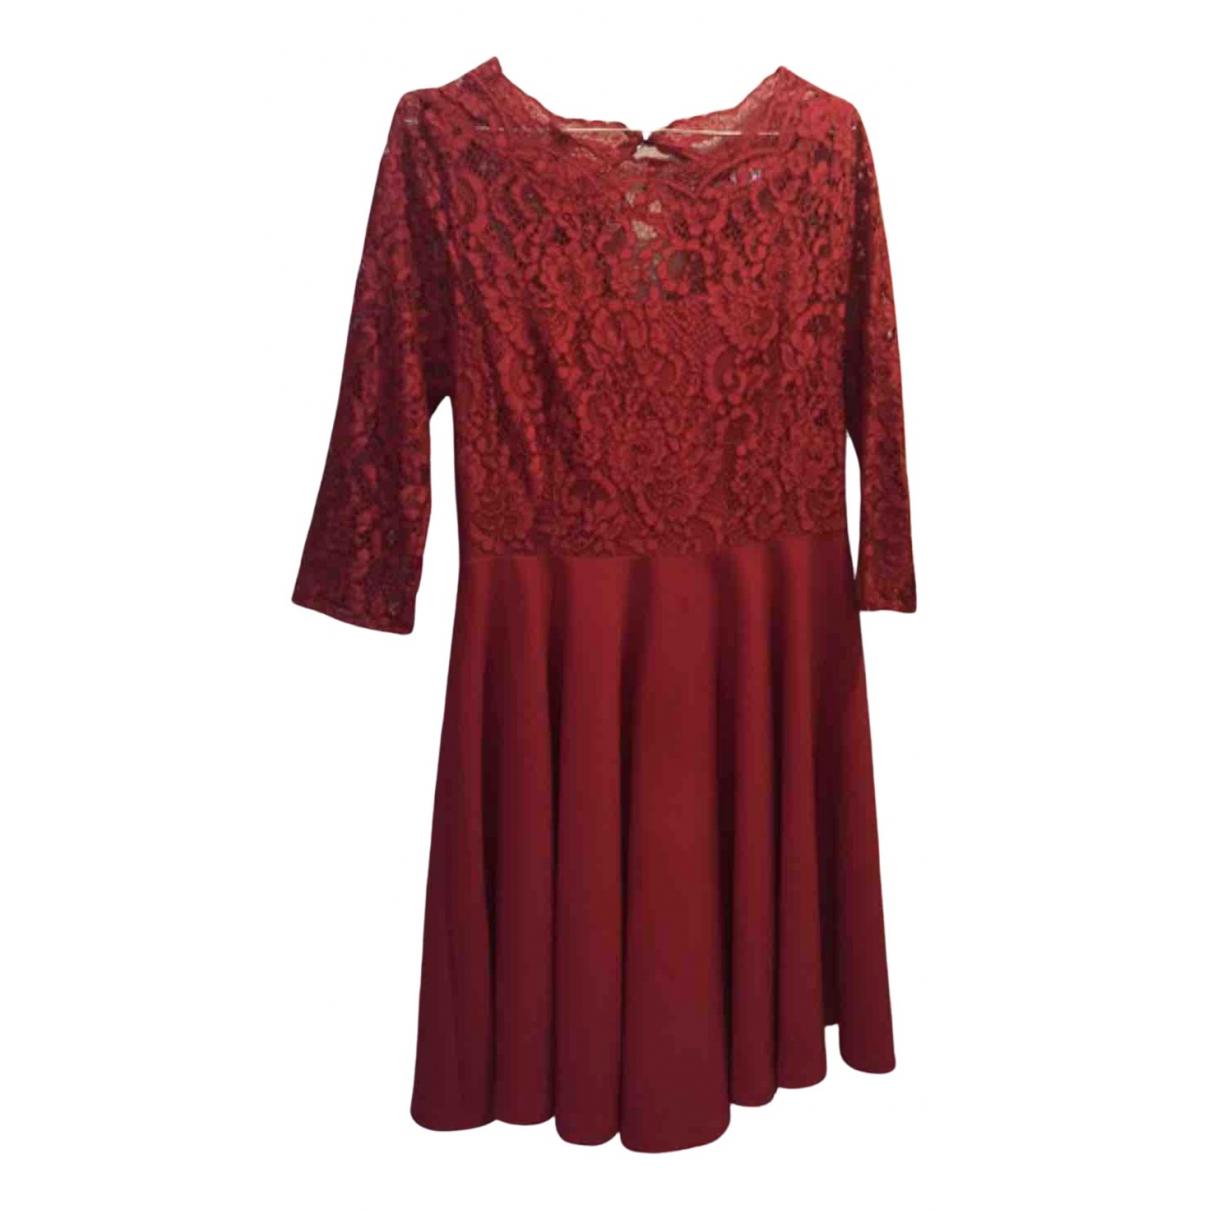 Claudie Pierlot N Red Lace dress for Women 40 FR